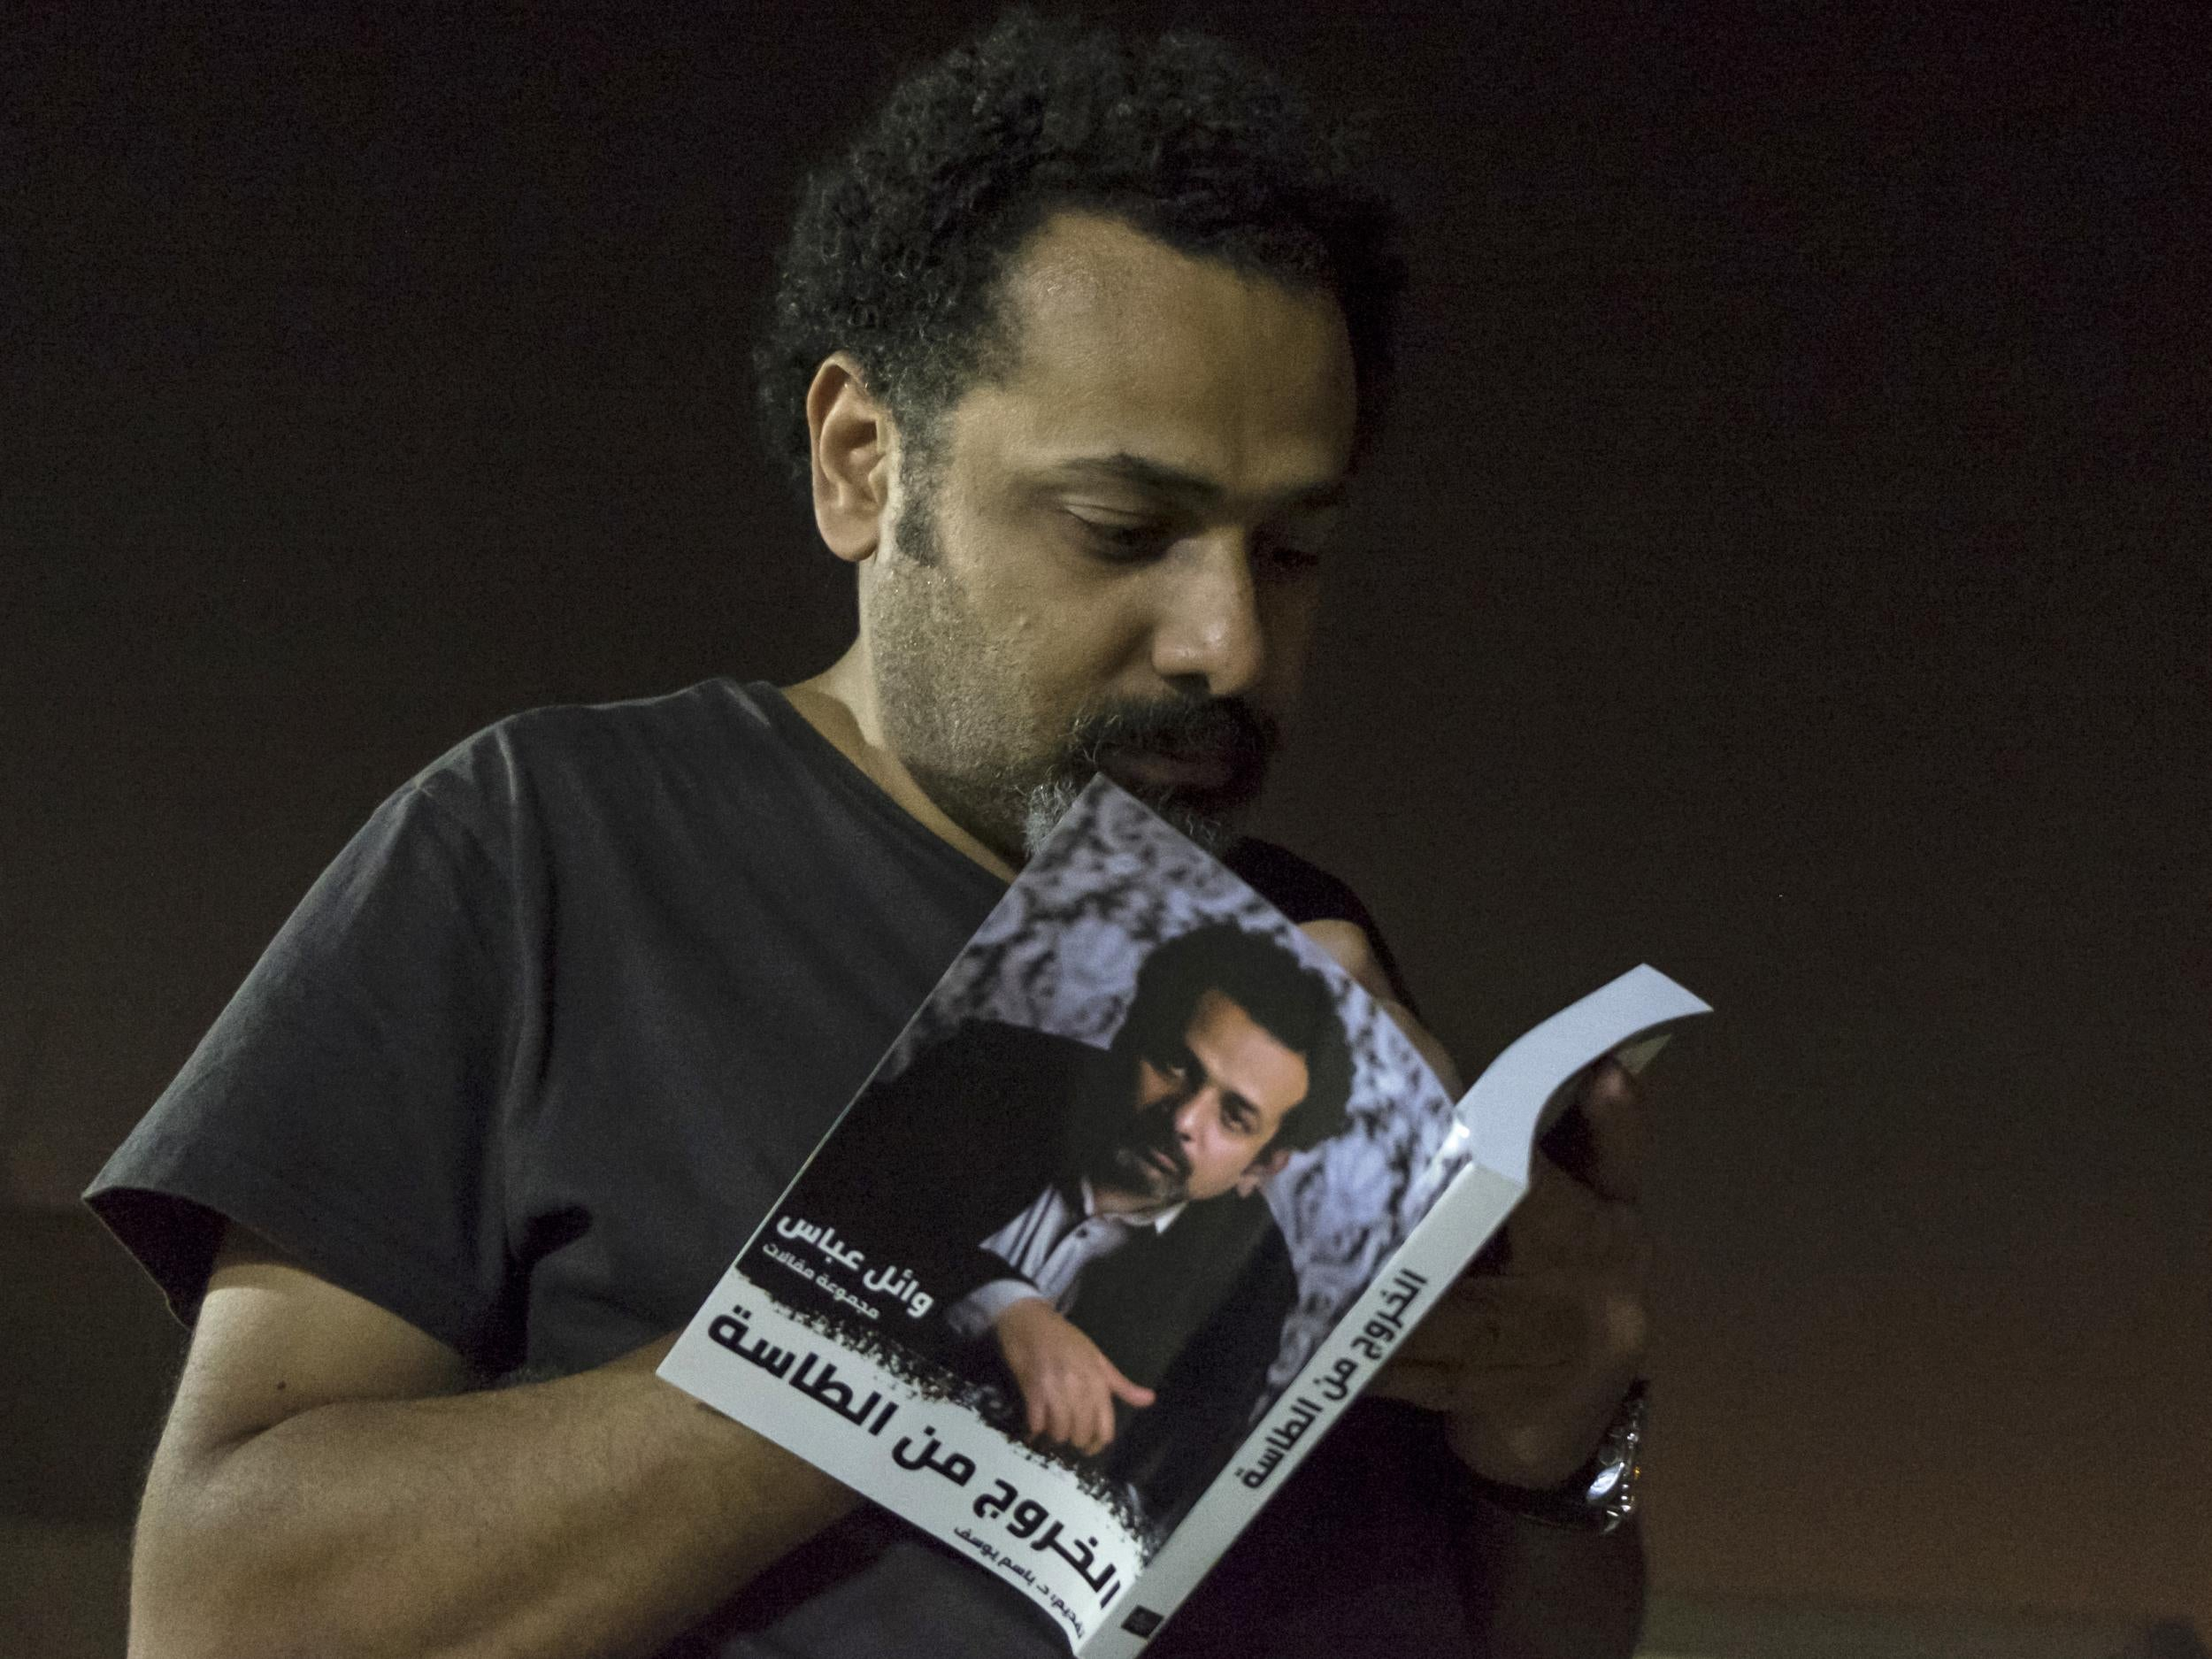 Egypt detains activist blogger amid new wave of arrests